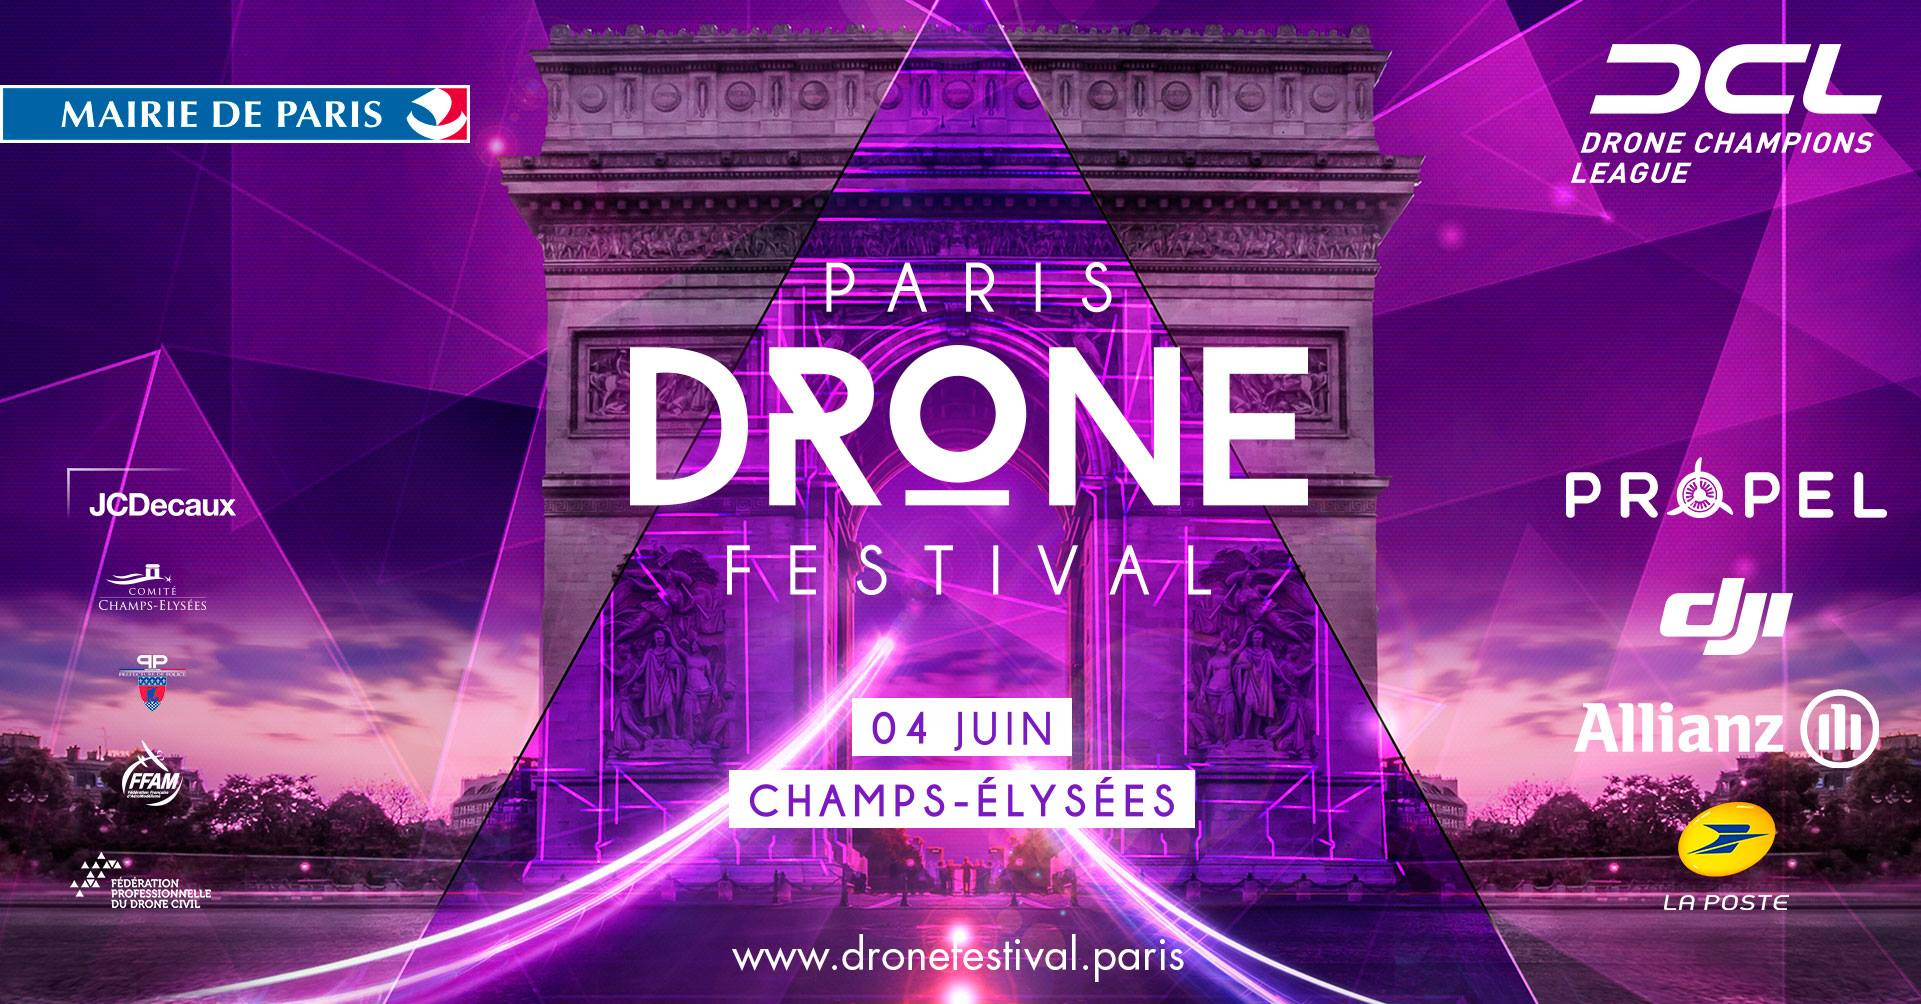 paris drone festival 2017 drone fpv news. Black Bedroom Furniture Sets. Home Design Ideas